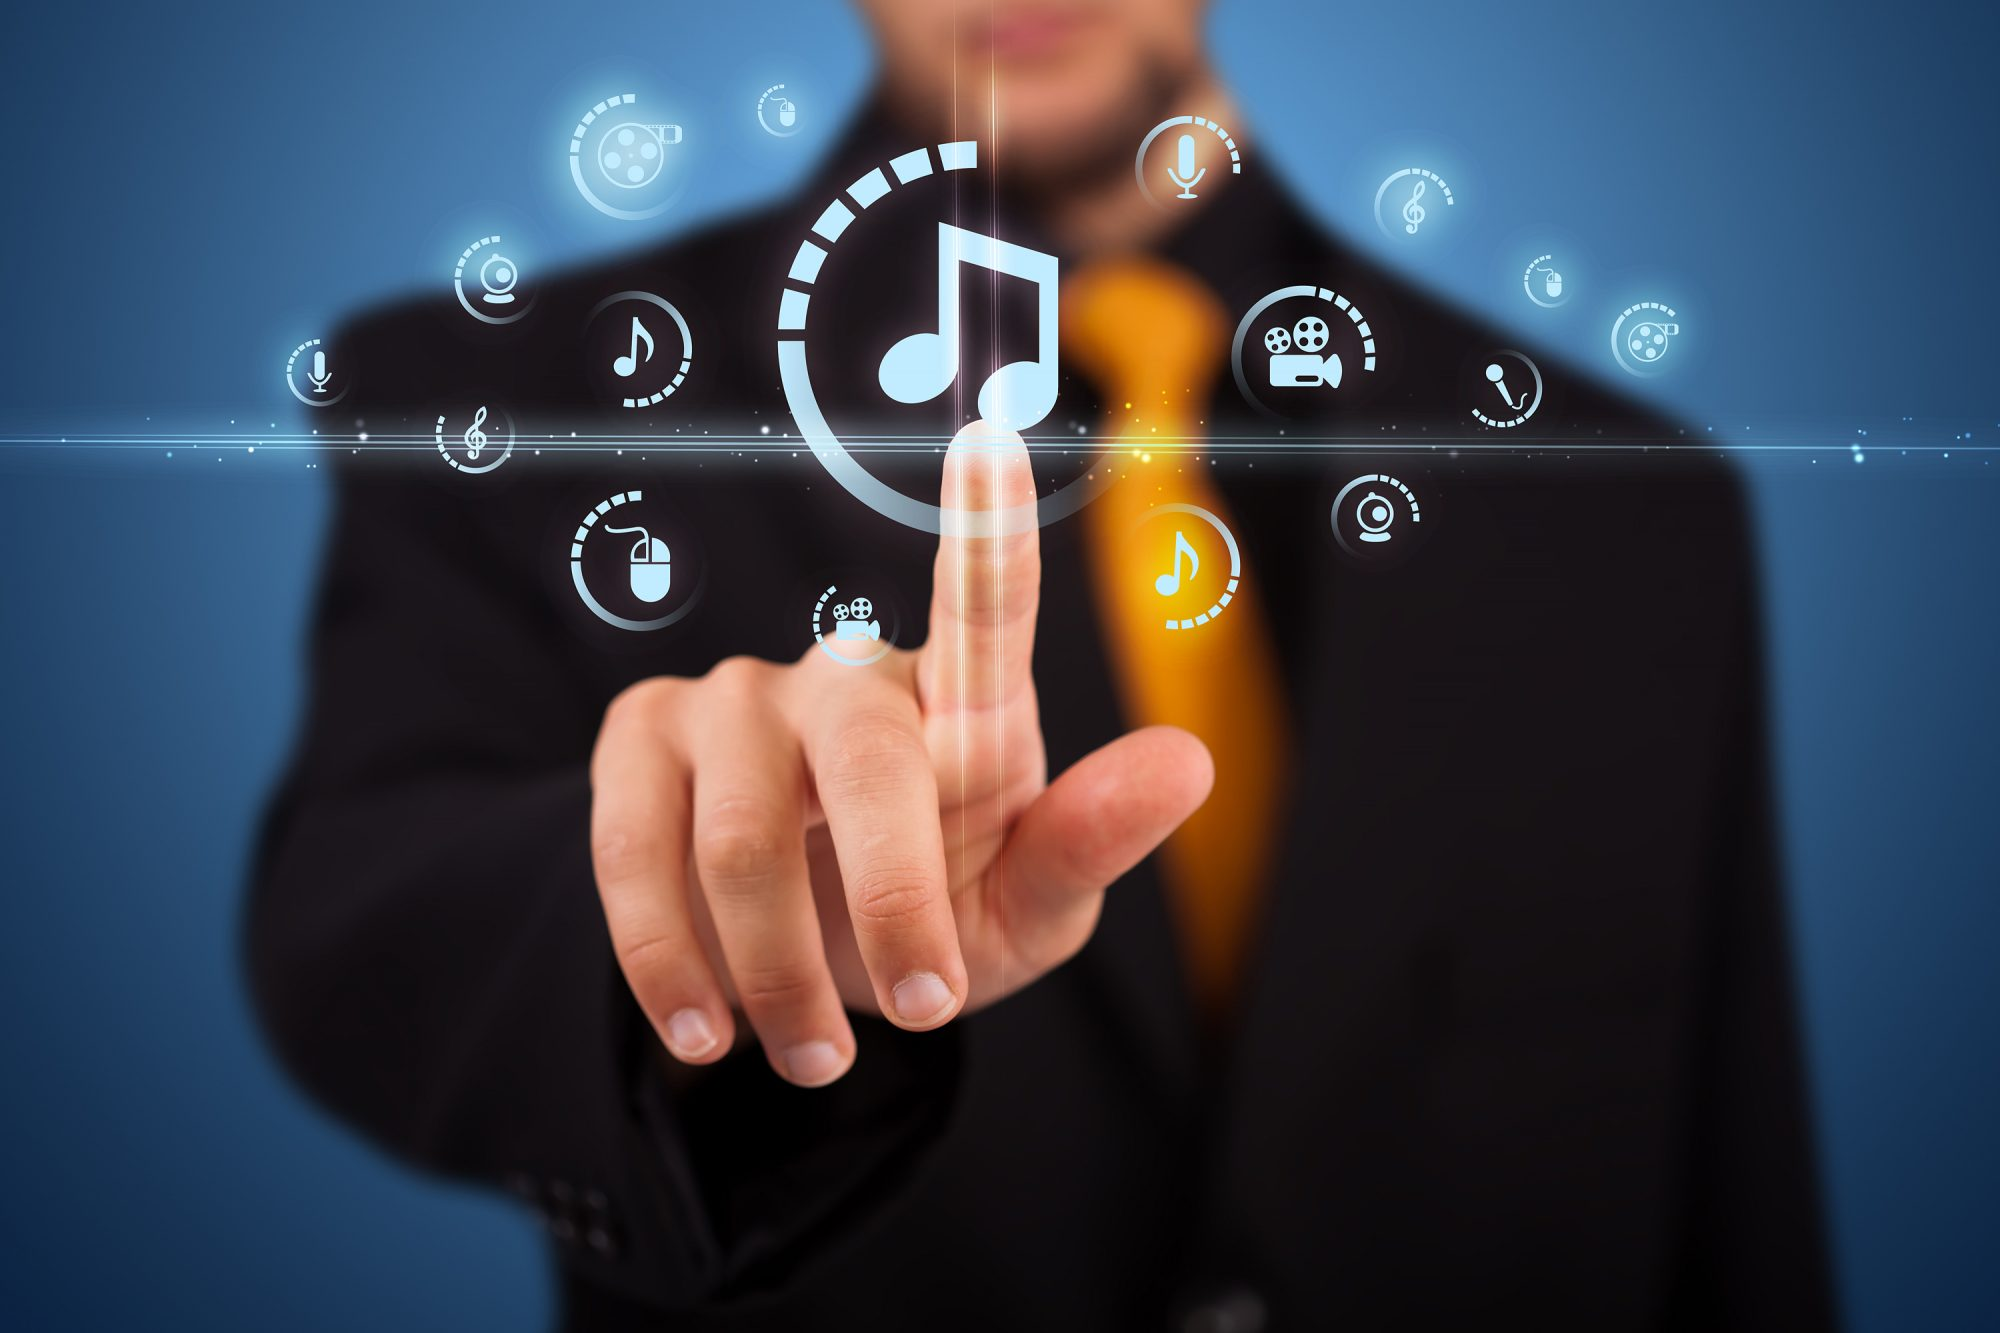 CJ Corp Chooses Amazon Blockchain Solution for Music Copyright Management